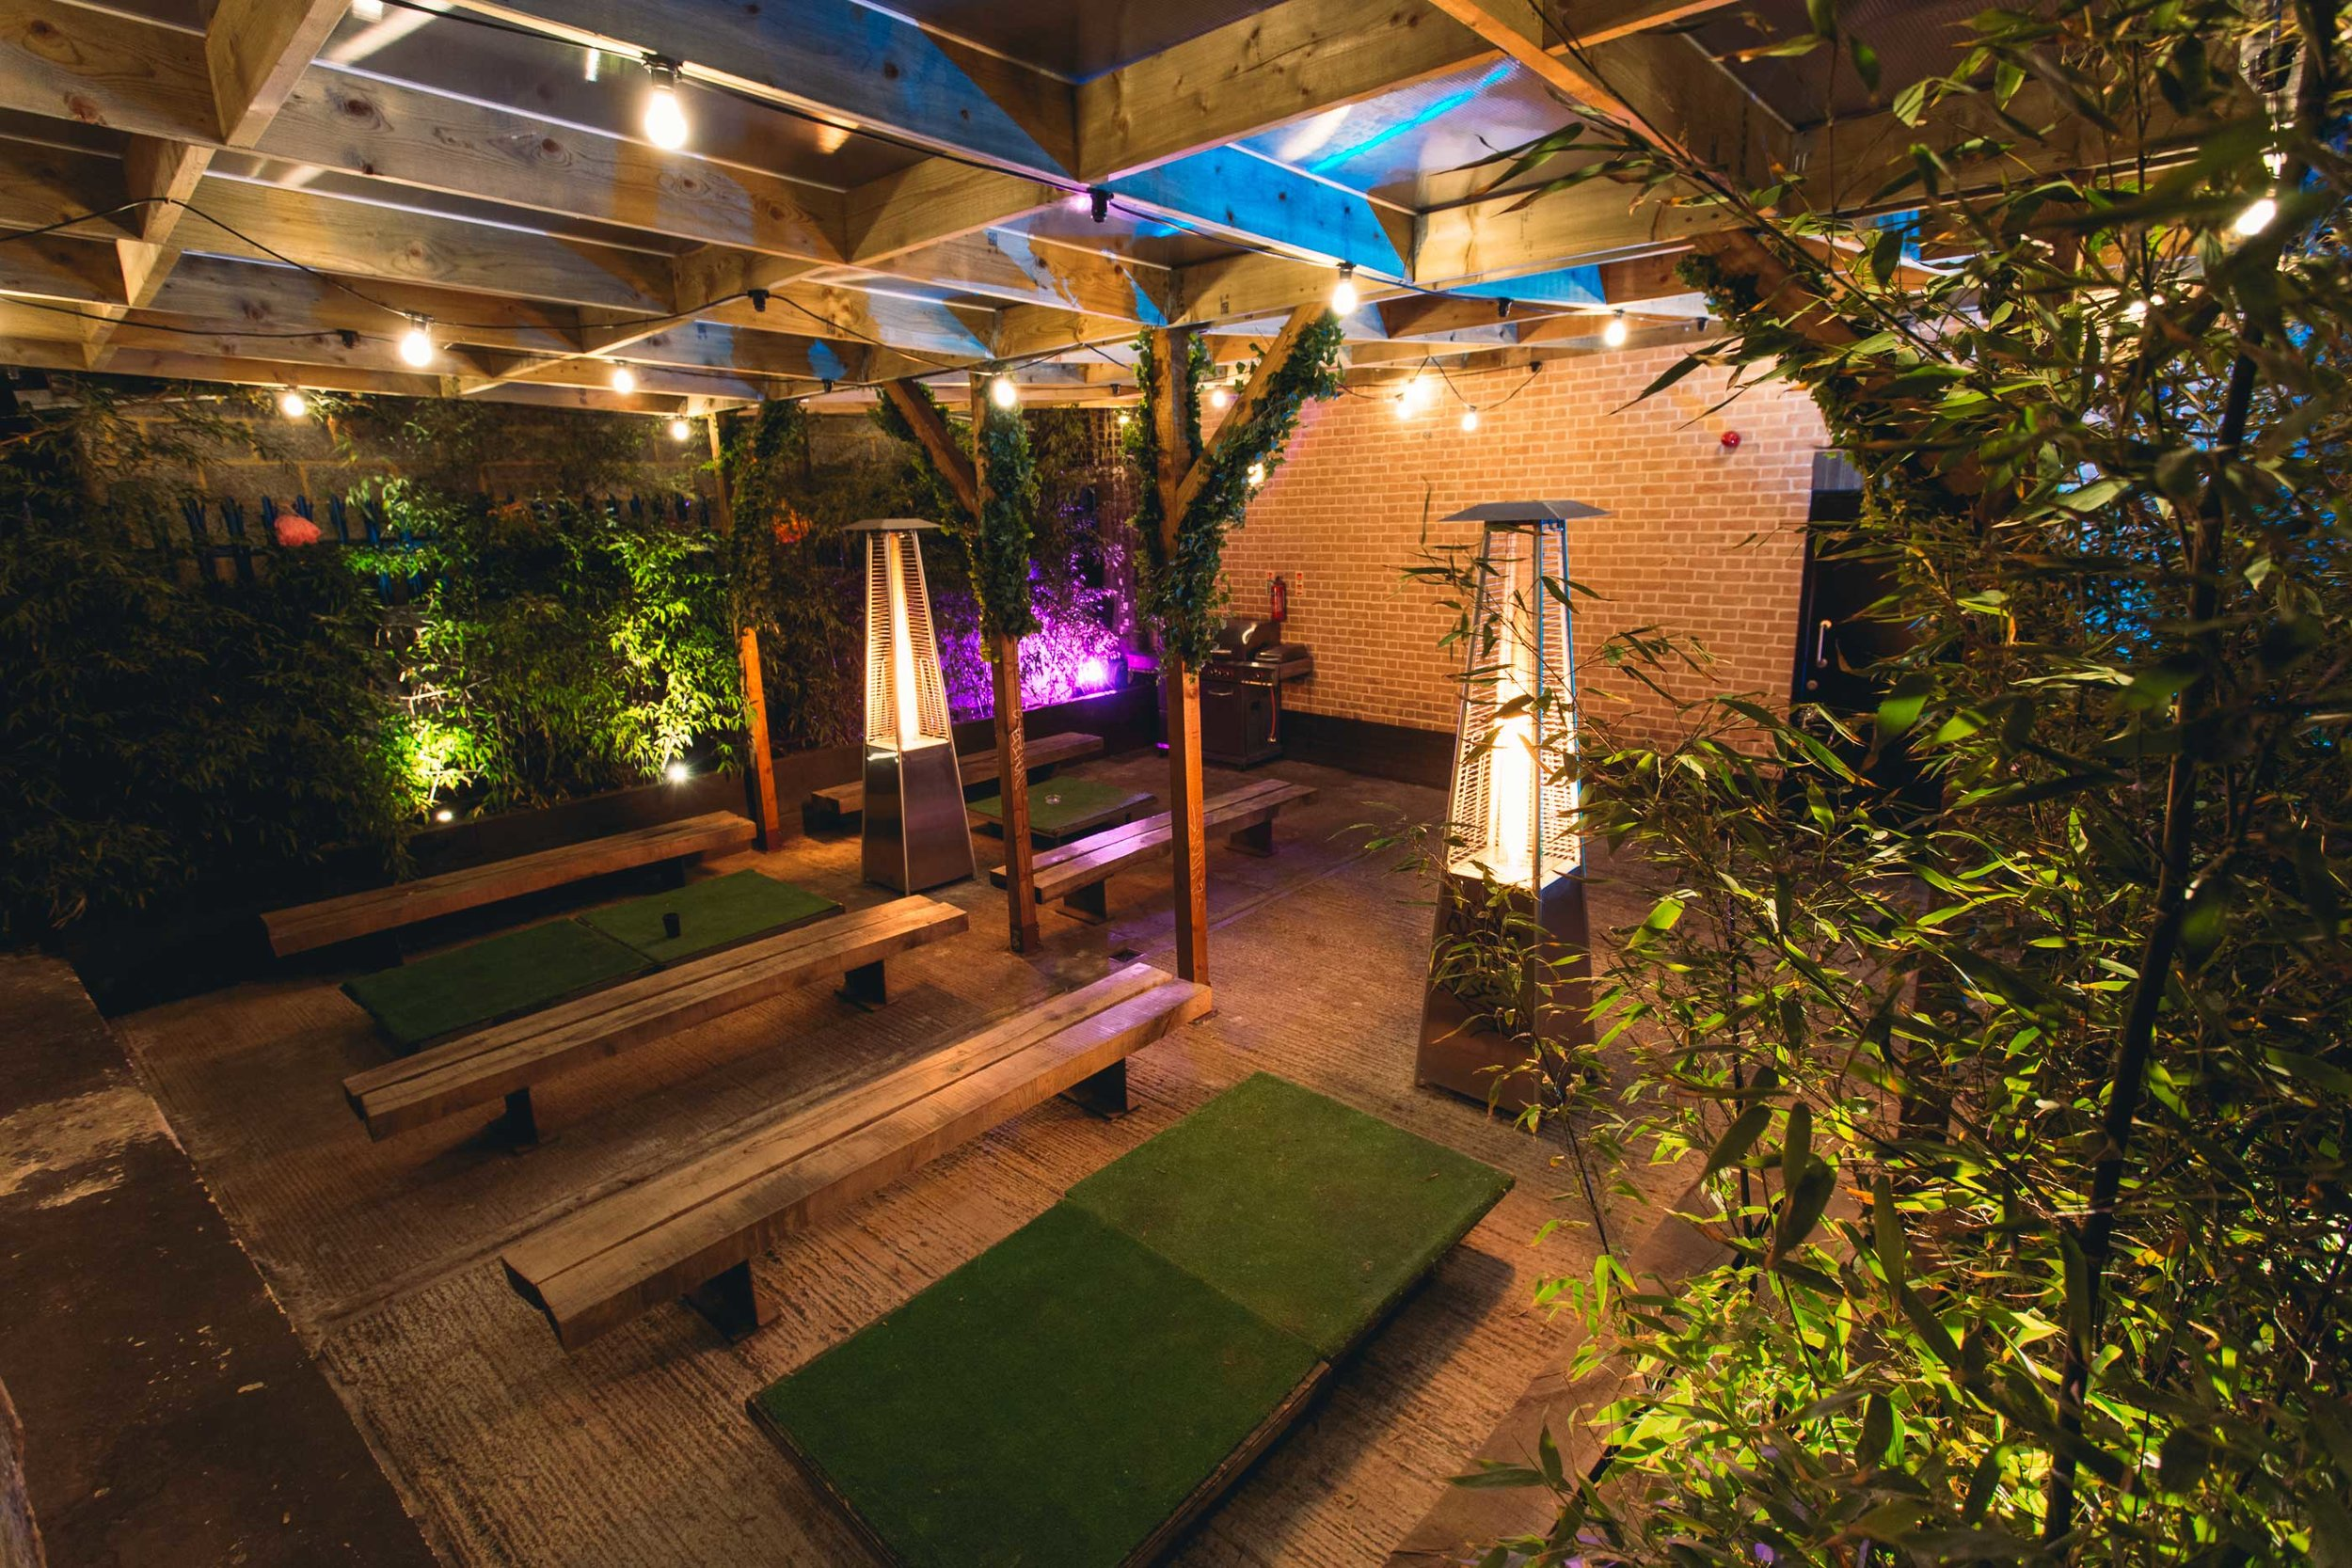 GardenNighttimeBackleft.jpg